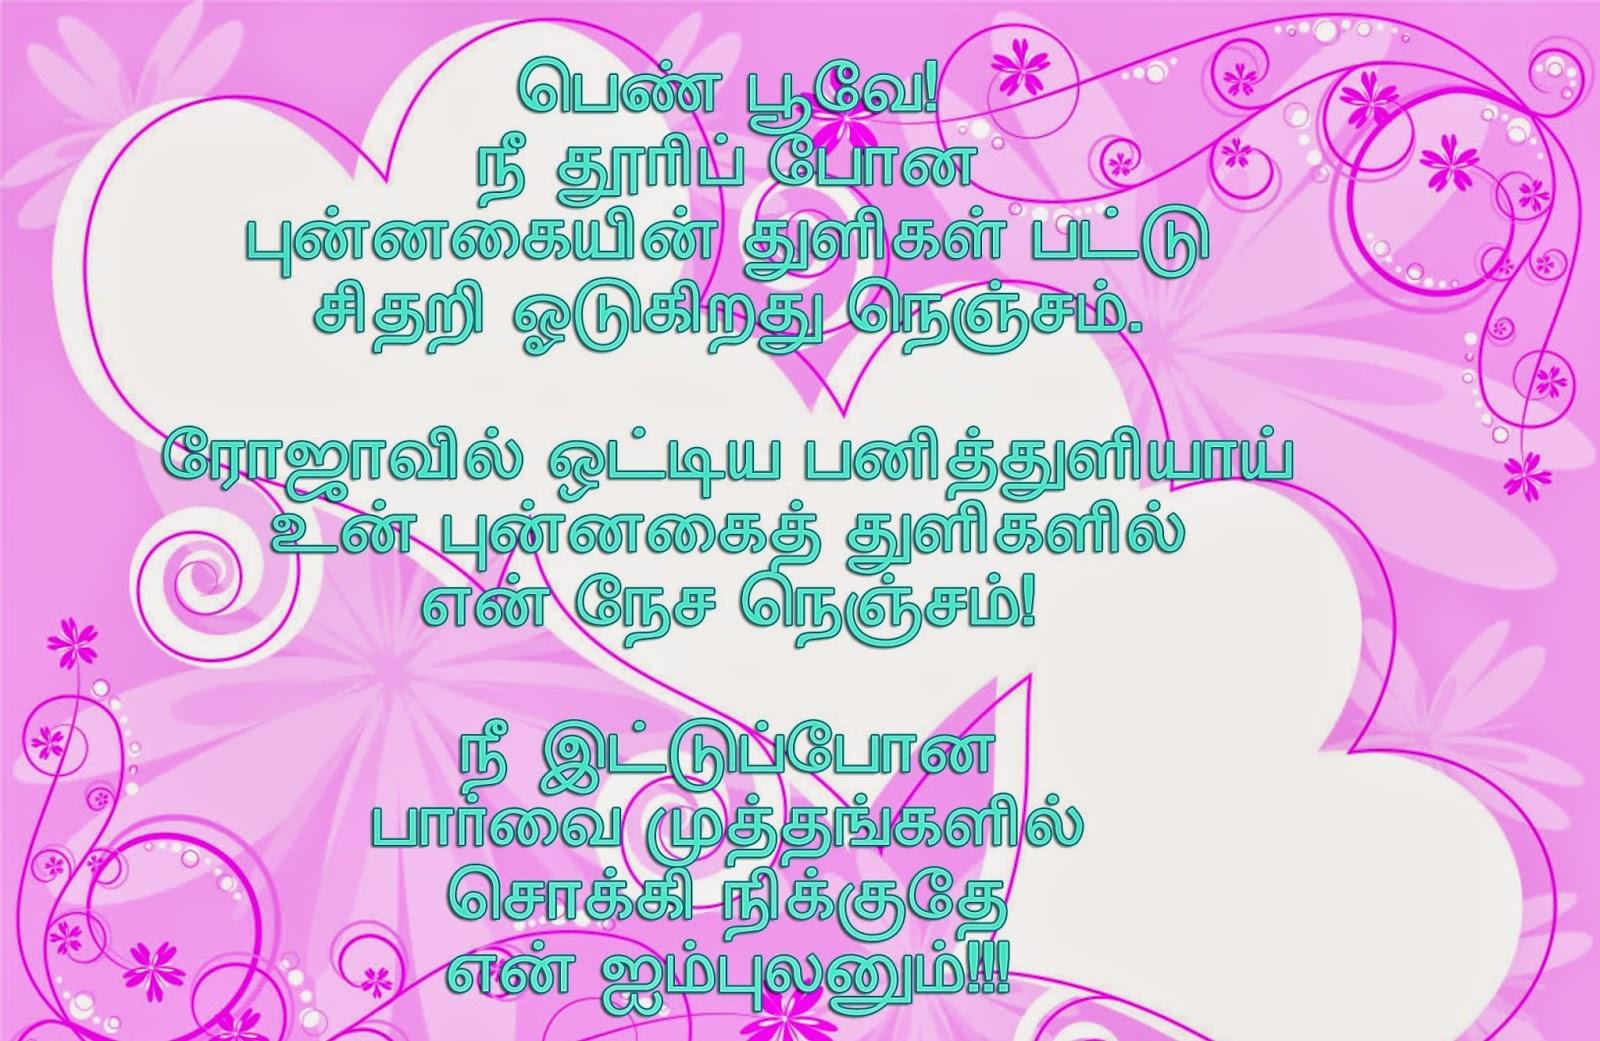 Kavithaikal tamil kadhal images tamil kadhal images thecheapjerseys Images